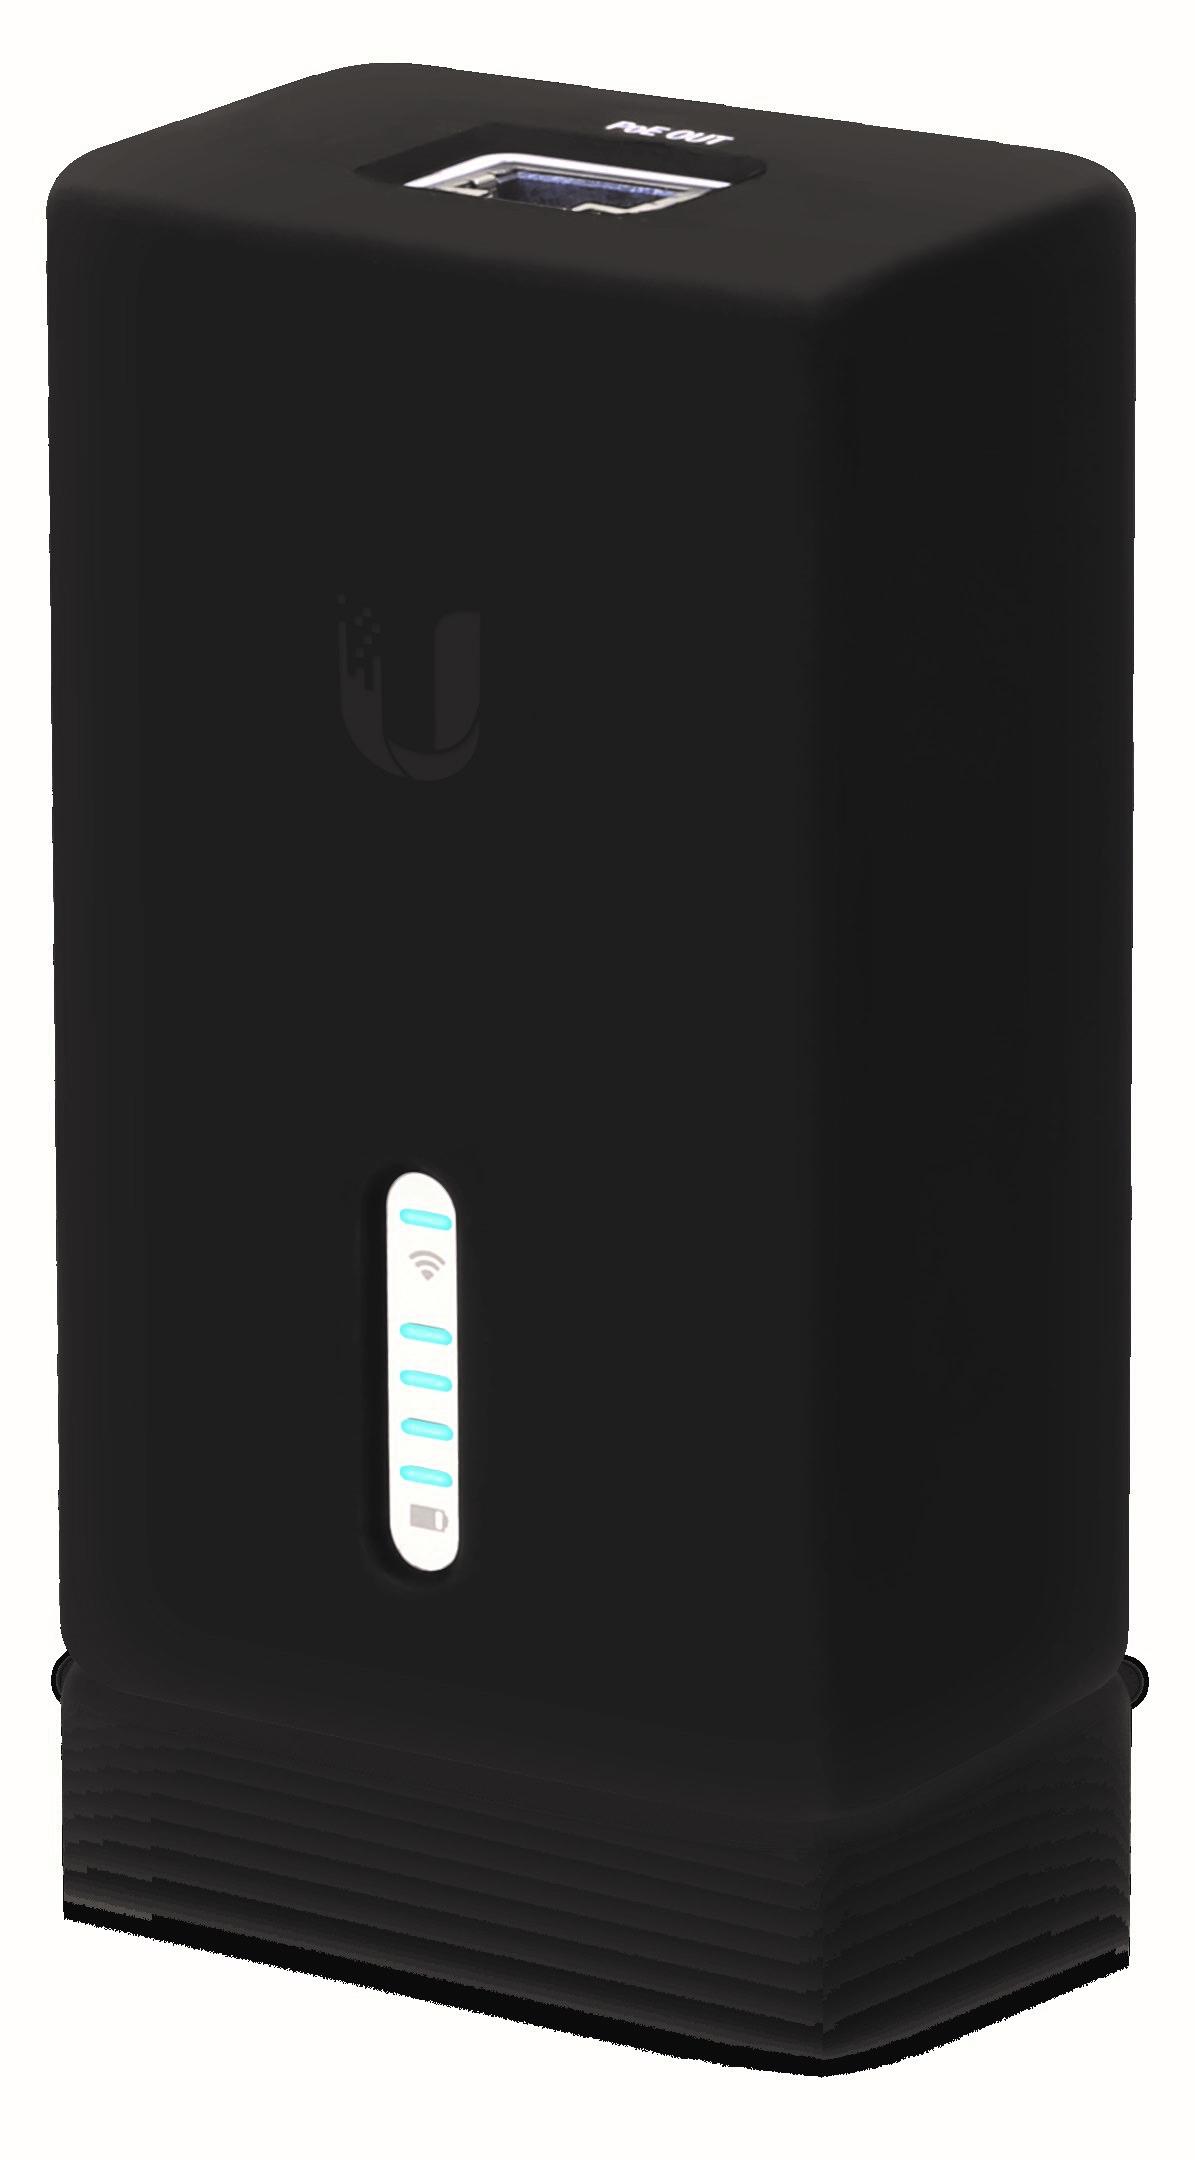 U-Installer Ubiquiti Installer Wi-Fi Connectivity to CPE 24V Pasif PoE